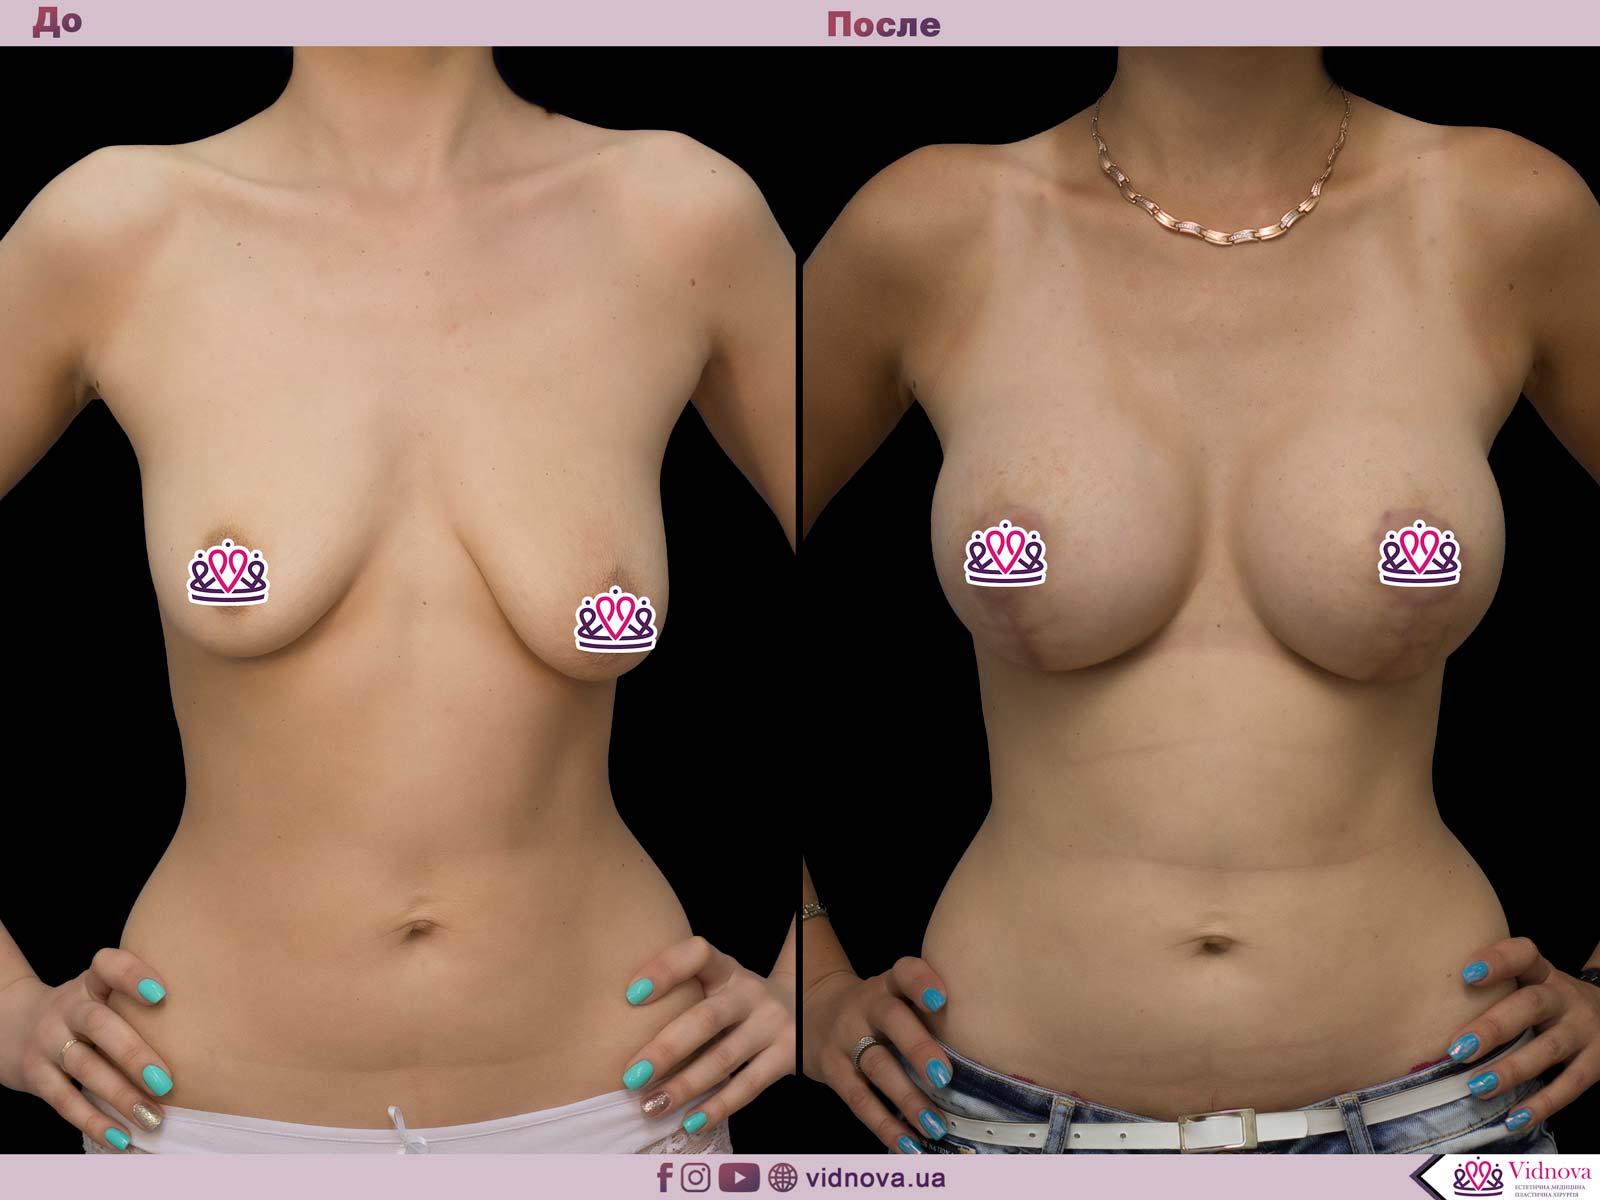 Подтяжка груди: Фото ДО и ПОСЛЕ - Пример №21-1 - Клиника Vidnova